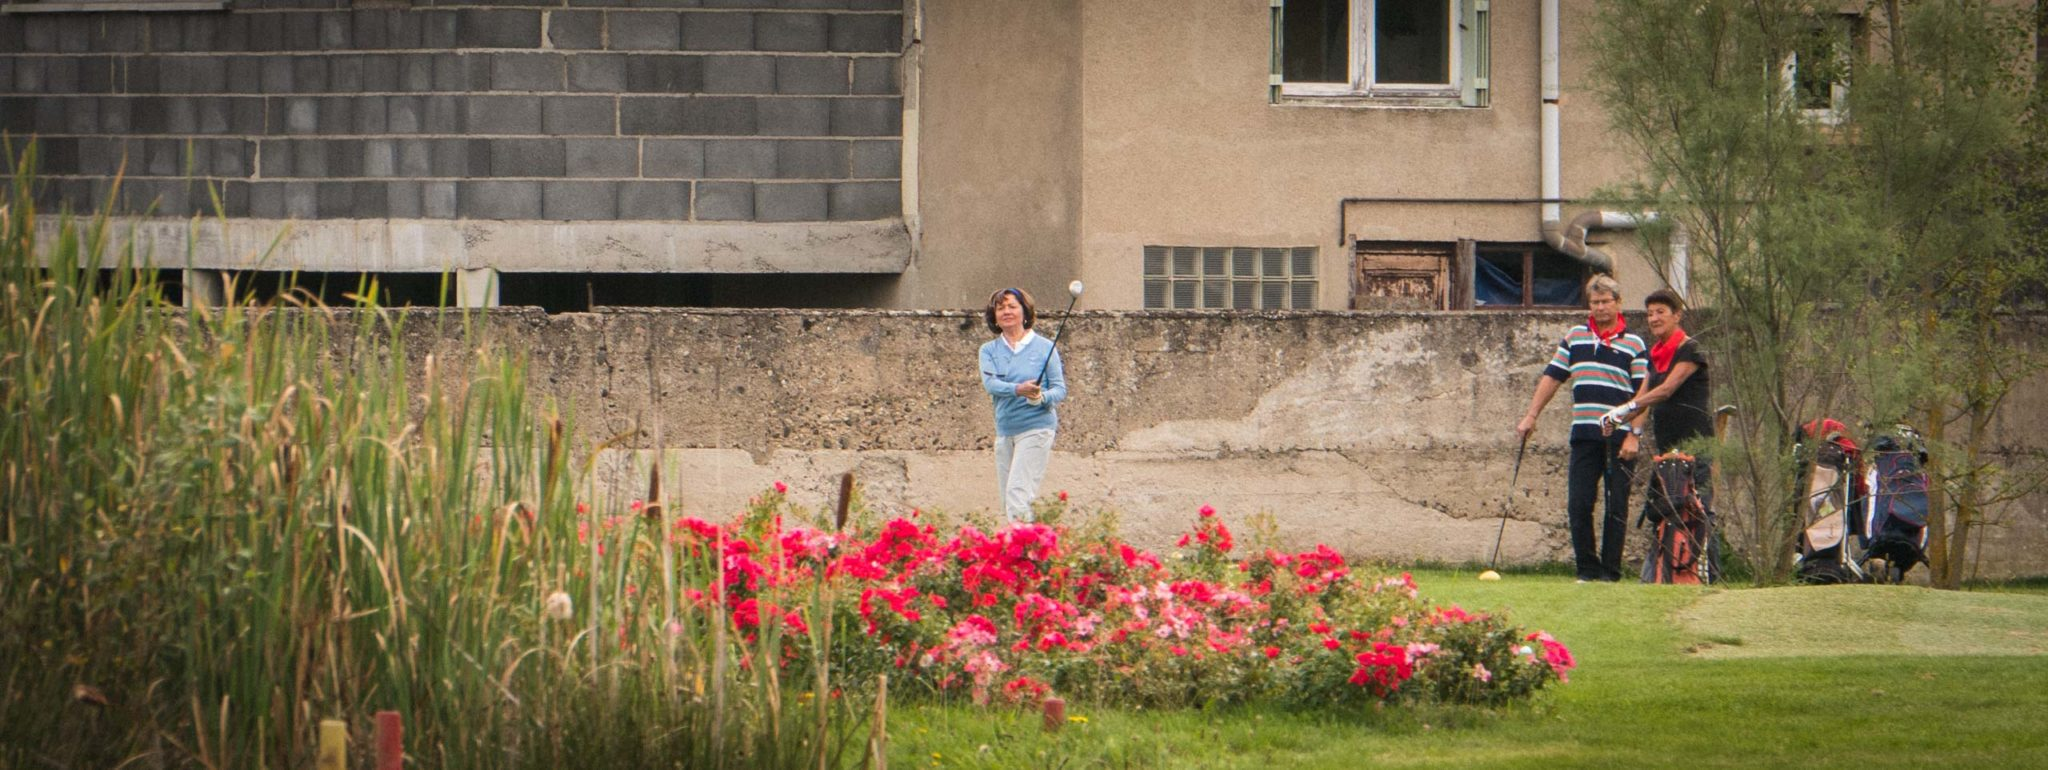 Condamin Pitch Putt 2017 Bords de Loire T6 19